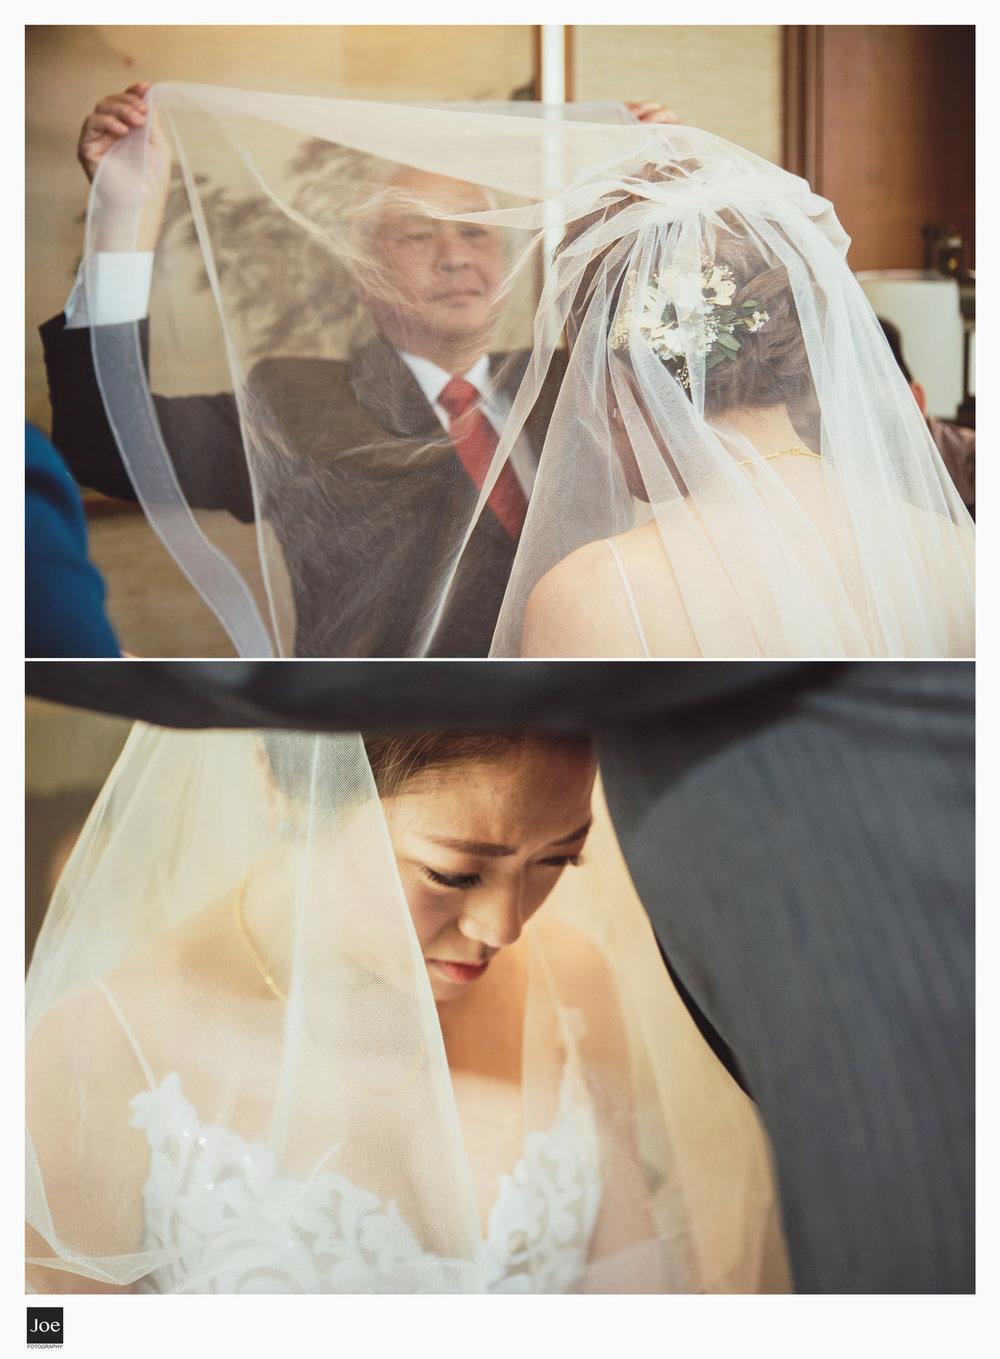 wedding-photography-shangri-la-far-eastern-plaza-hotel-ariel-sam-joe-fotography-074.jpg